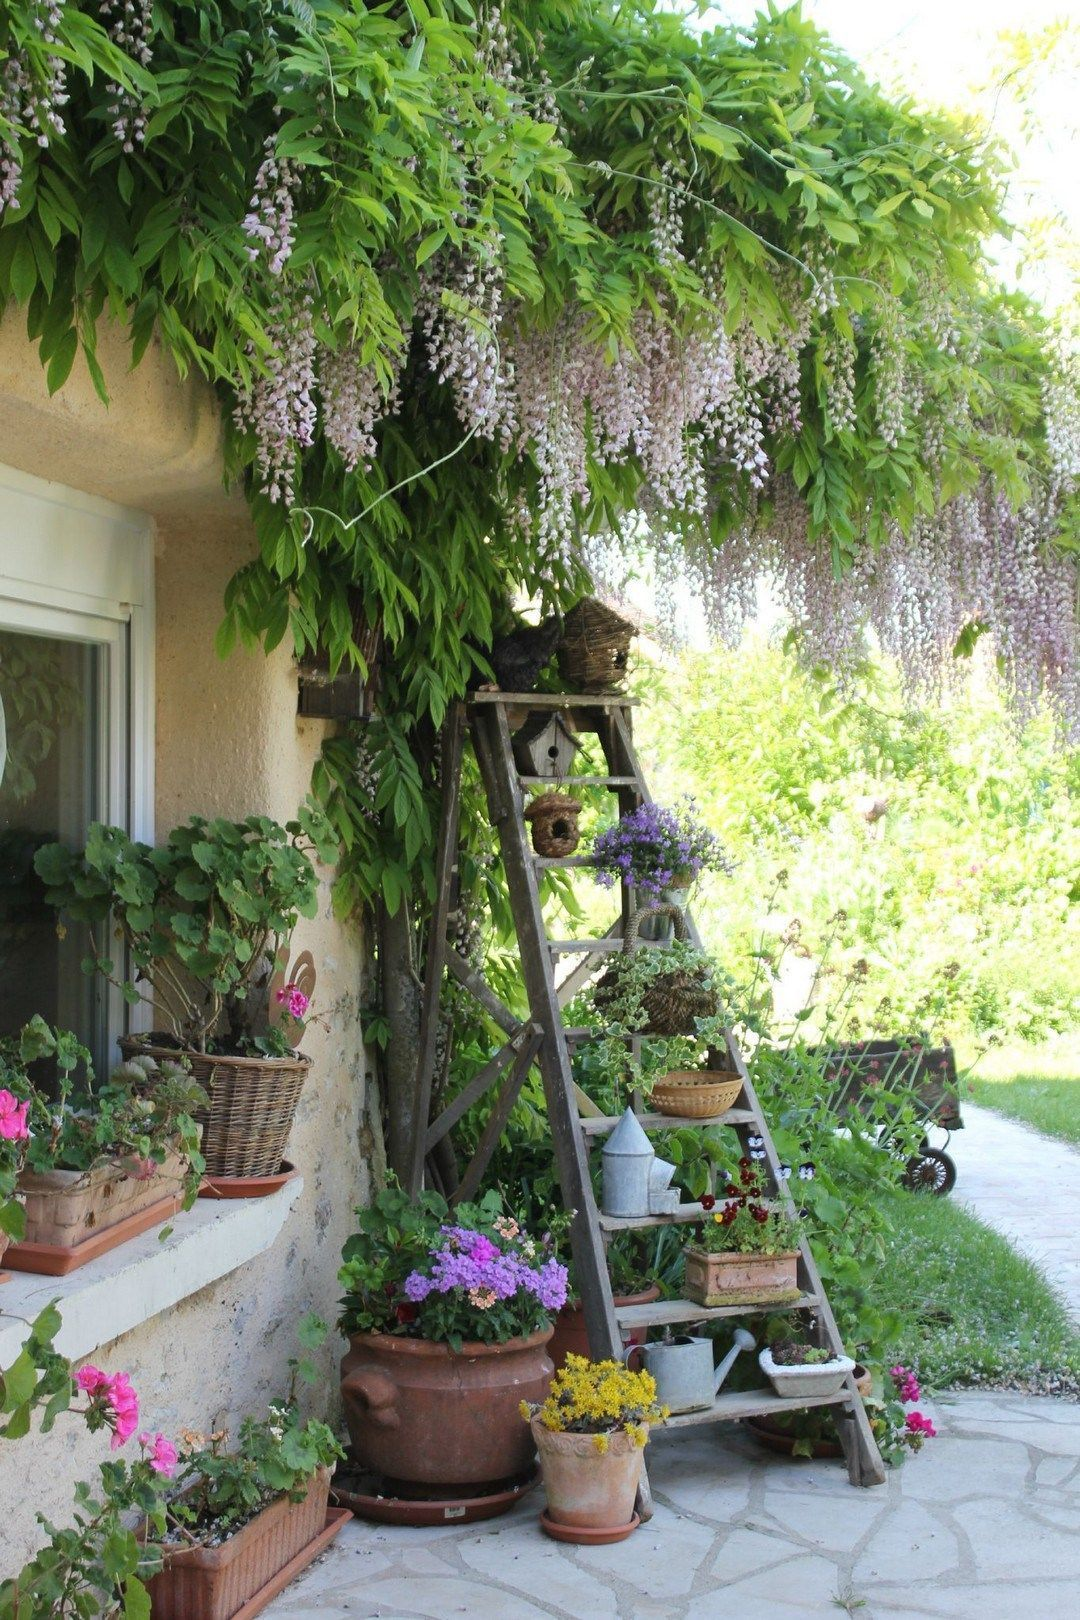 Best Diy Cottage Garden Ideas From Pinterest 3 Countrylandscape Cottagegardens Design Plants